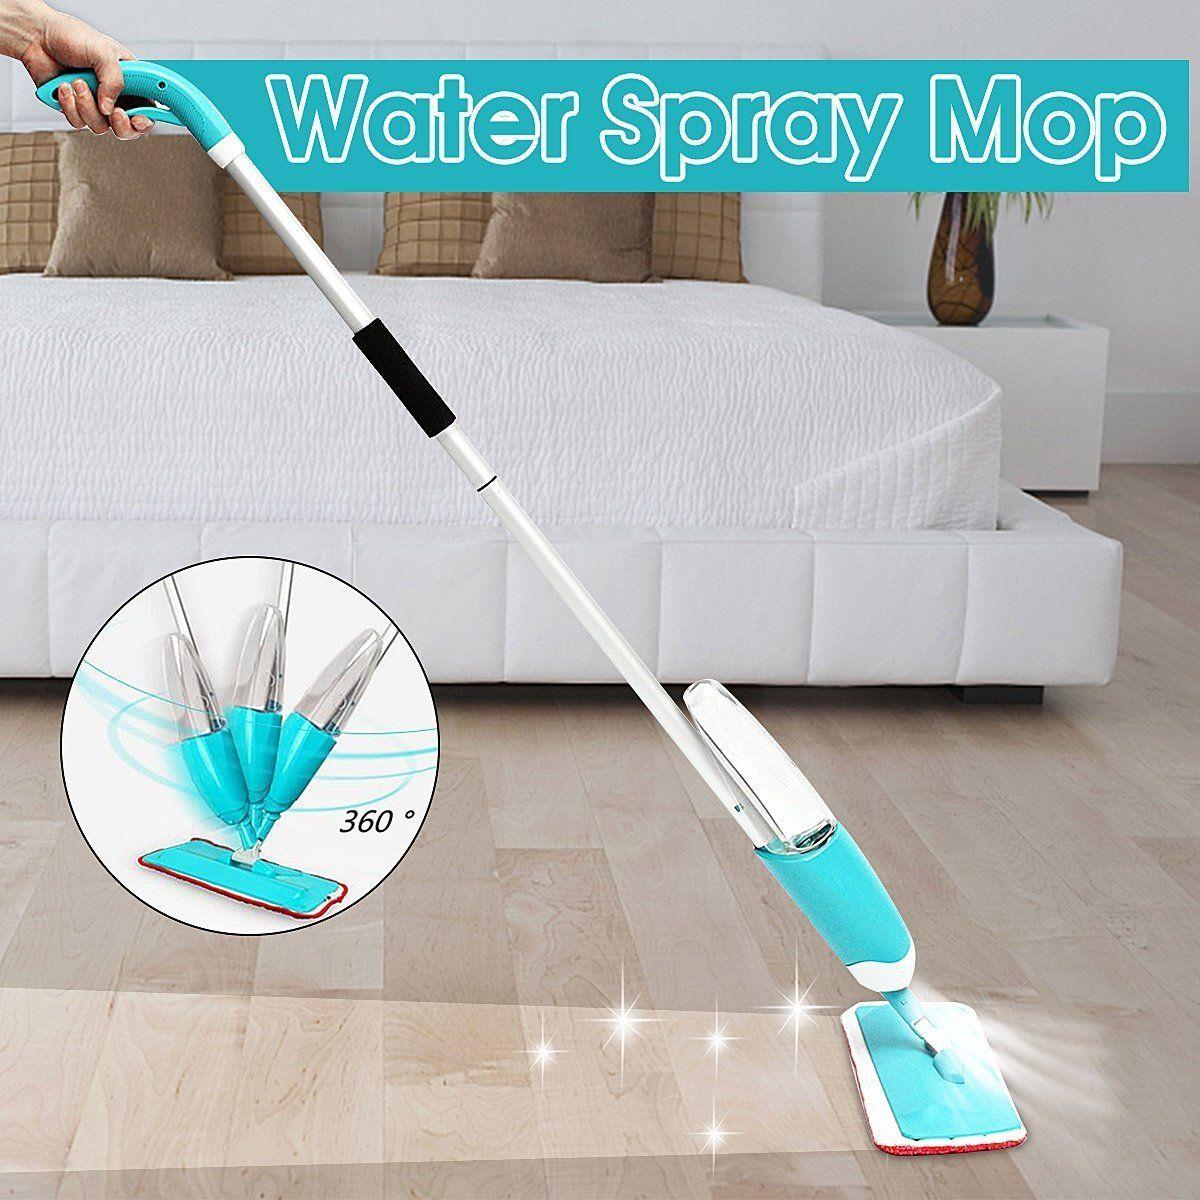 set Water Spray Mop 360 Degree Turning Household Home Kitchen Floor ...